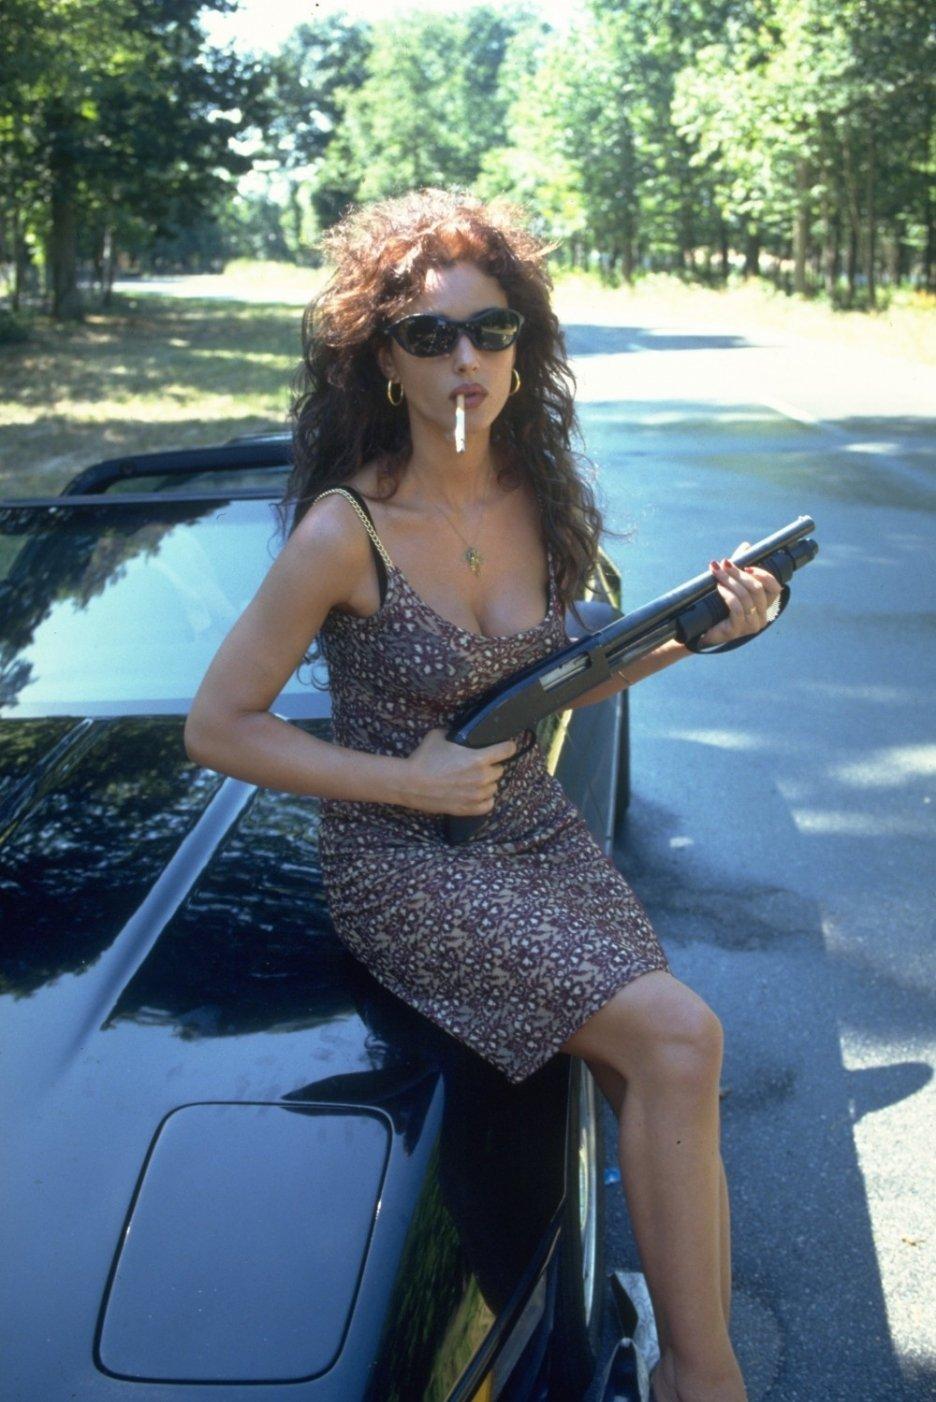 Моника Беллуччи / Monica Bellucci - Страница 4 C15c3abf7c2a